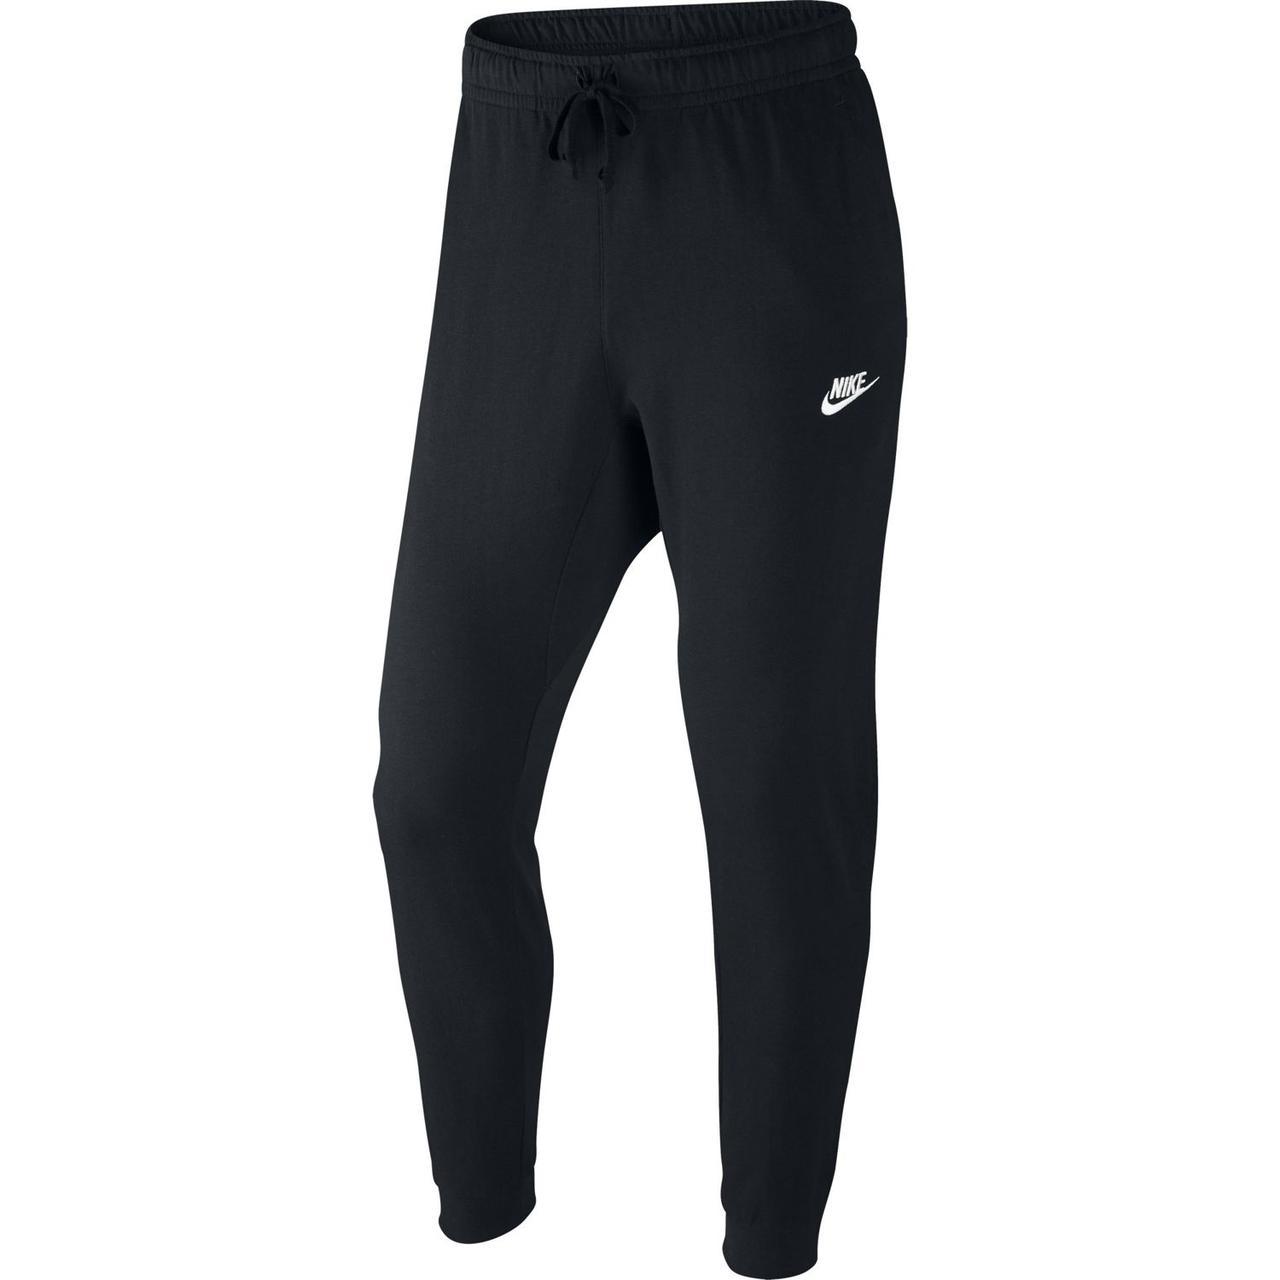 263c03c7 Штаны Nike Sweat Pants 804461-010 (Оригинал) - Football Mall - футбольный  интернет